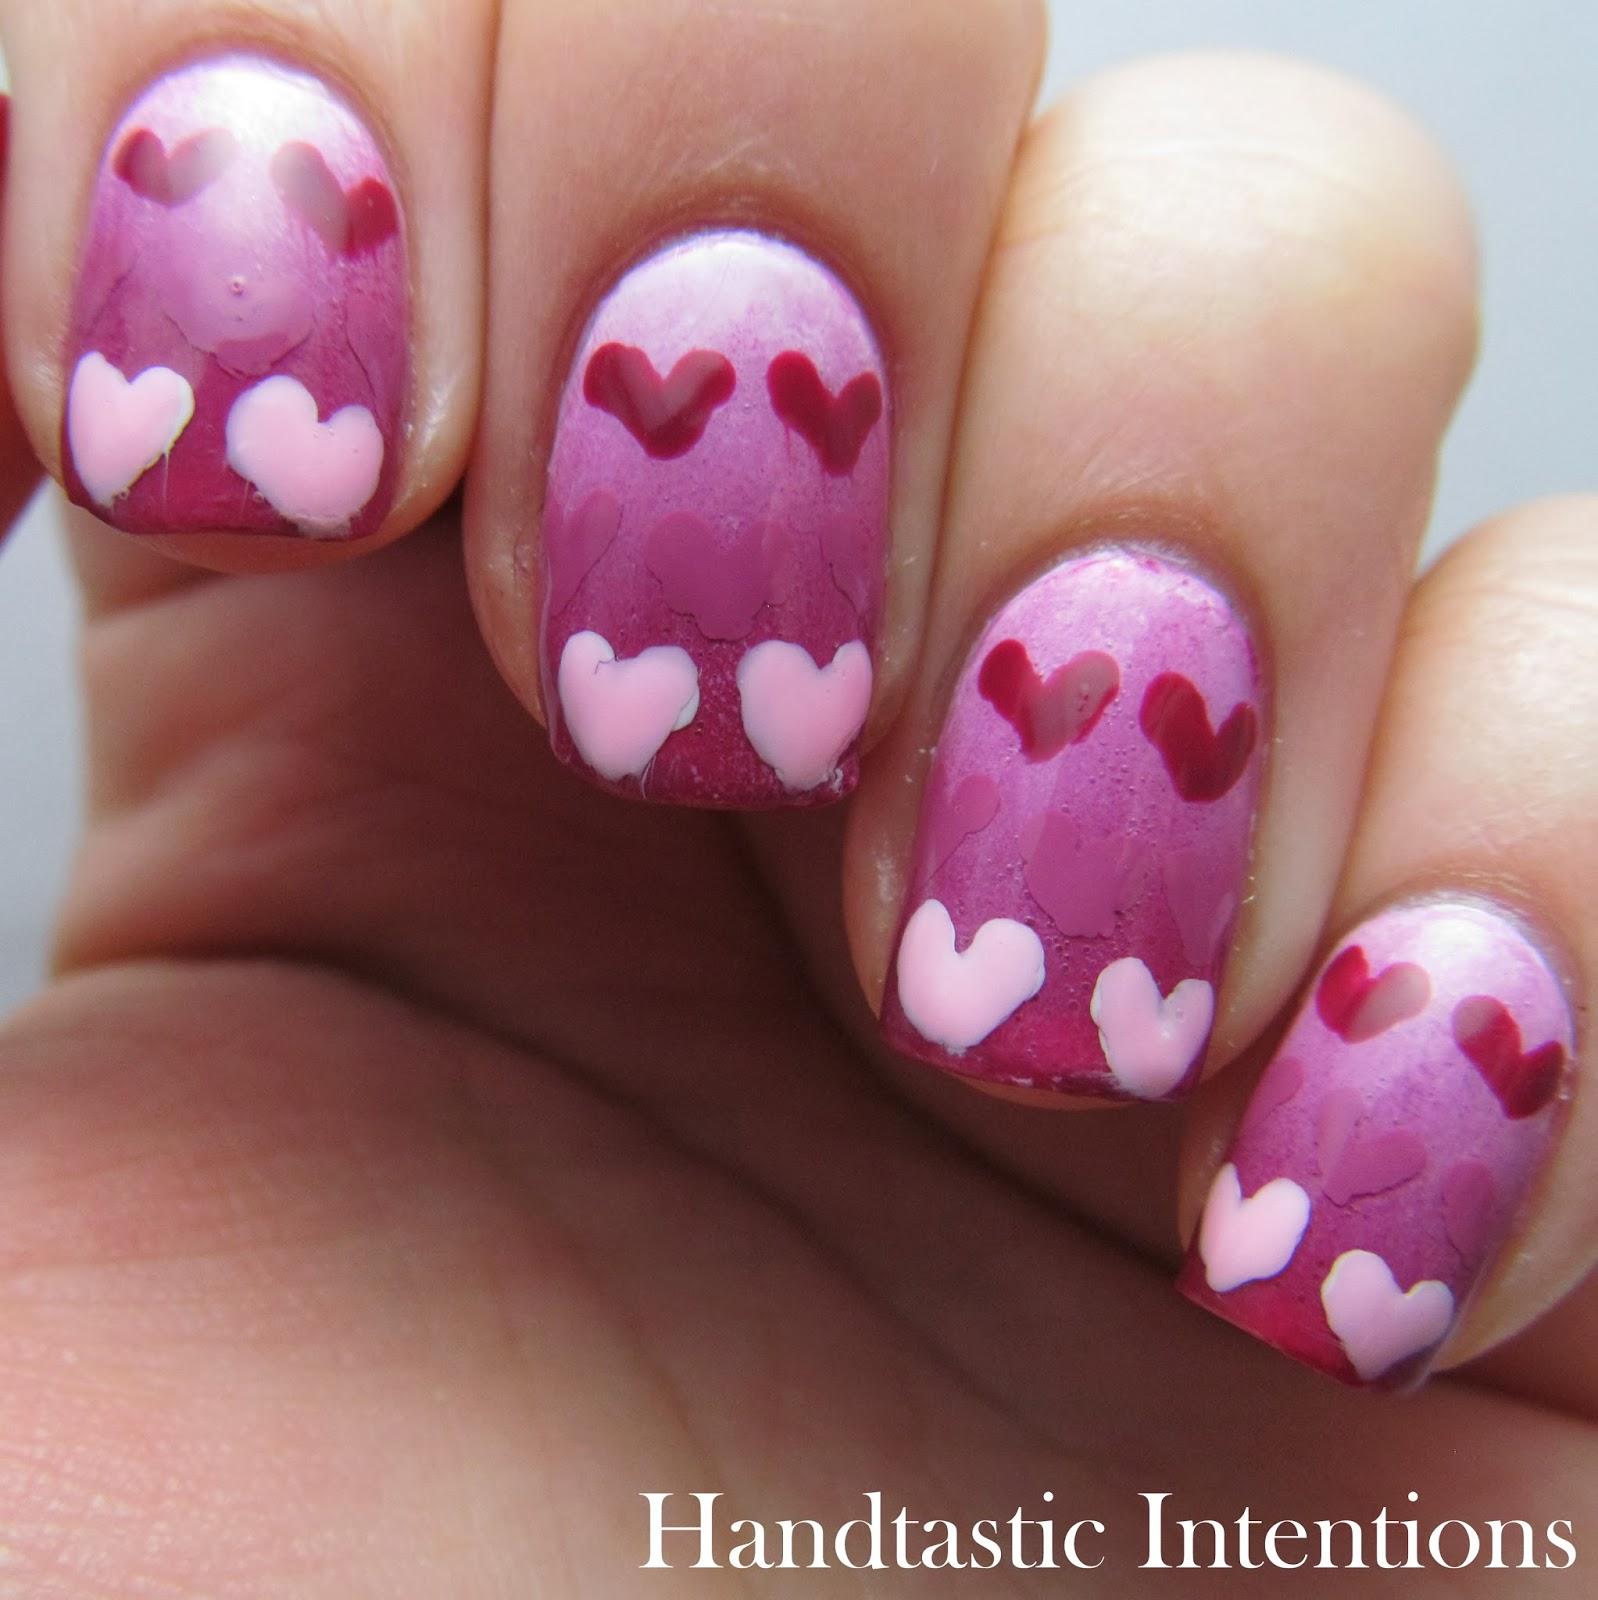 Gradient Nail Art: Handtastic Intentions: Nail Art: Gradient Hearts